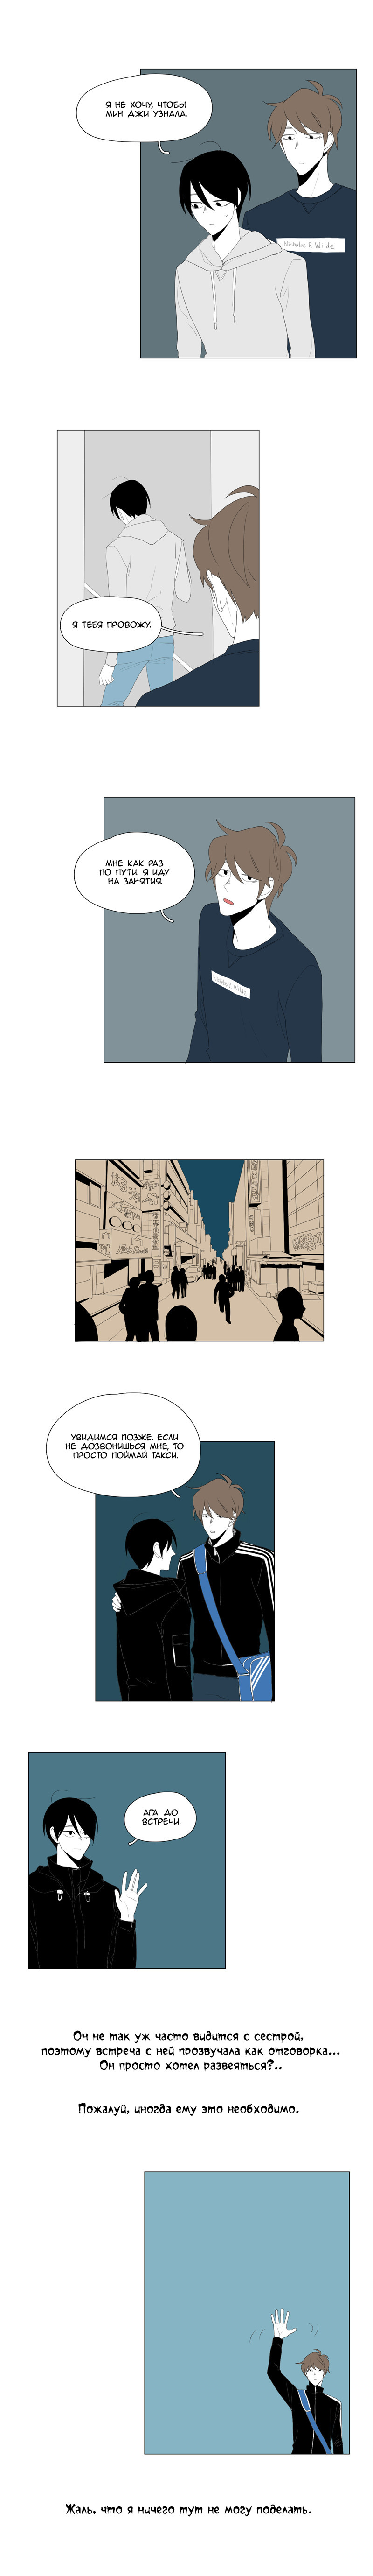 https://r1.ninemanga.com/comics/pic2/33/27873/314633/1482174983732.jpg Page 9